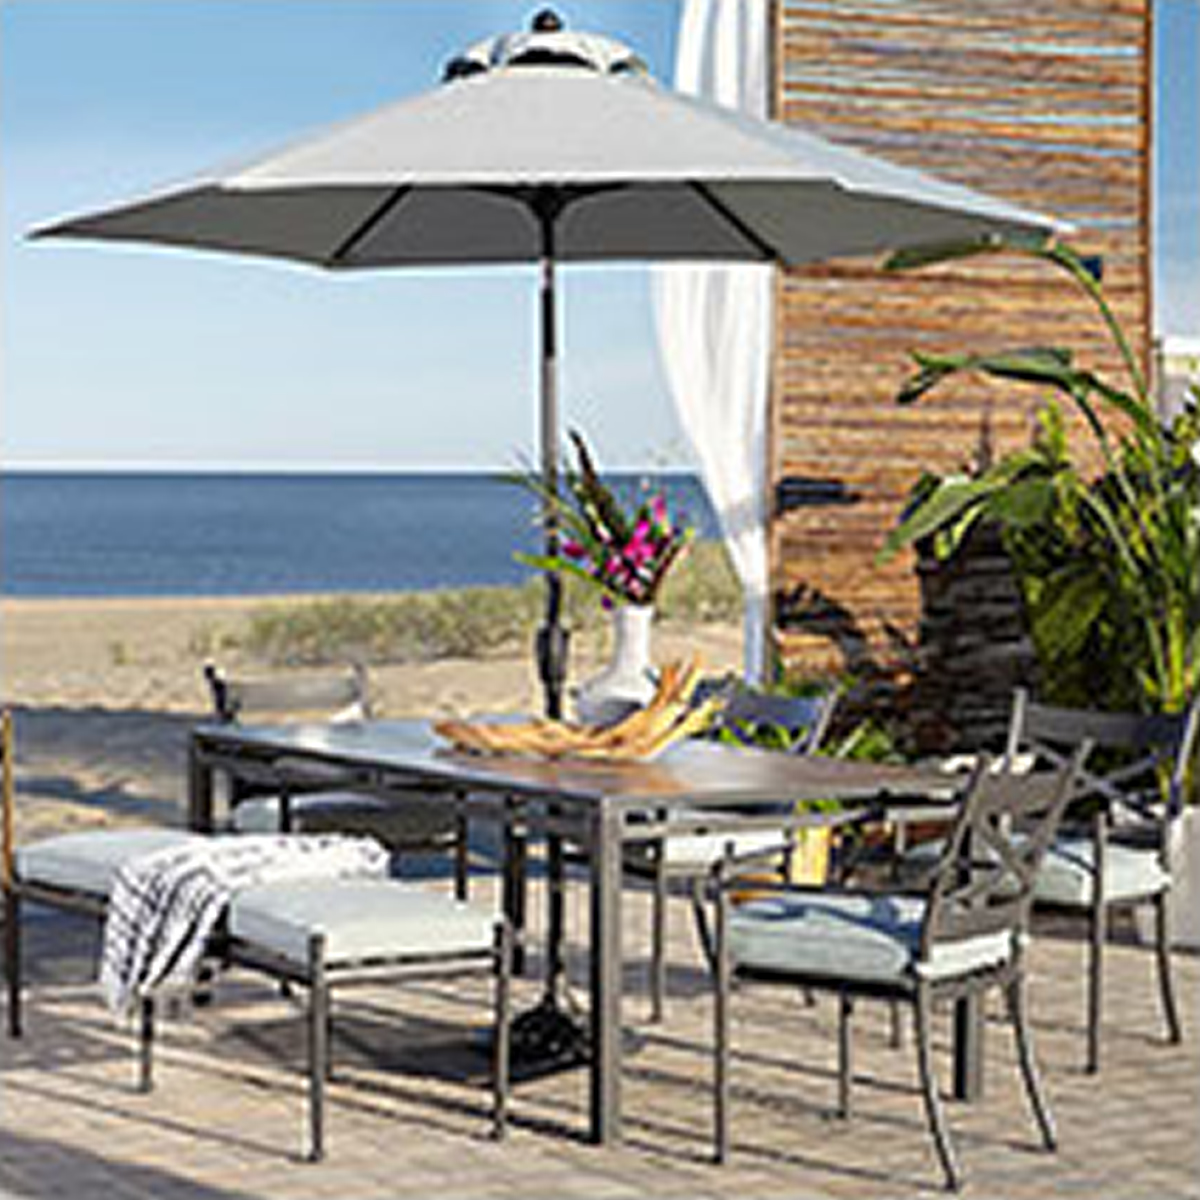 Outdoor Bar & Dining